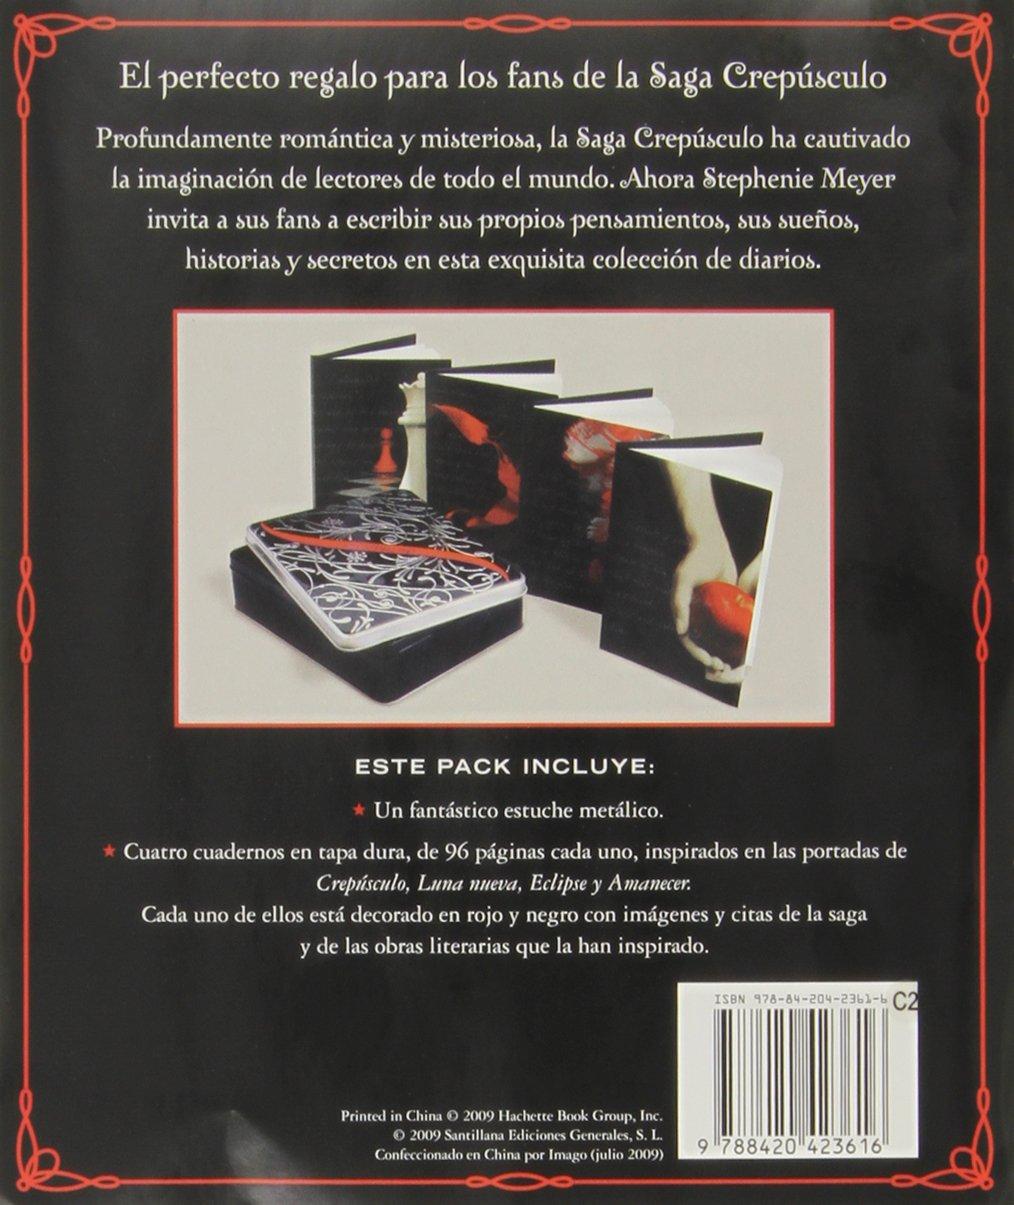 DIARIOS SAGA CREPUSCULO La Saga Crepusculo / Twilight Saga: Amazon ...